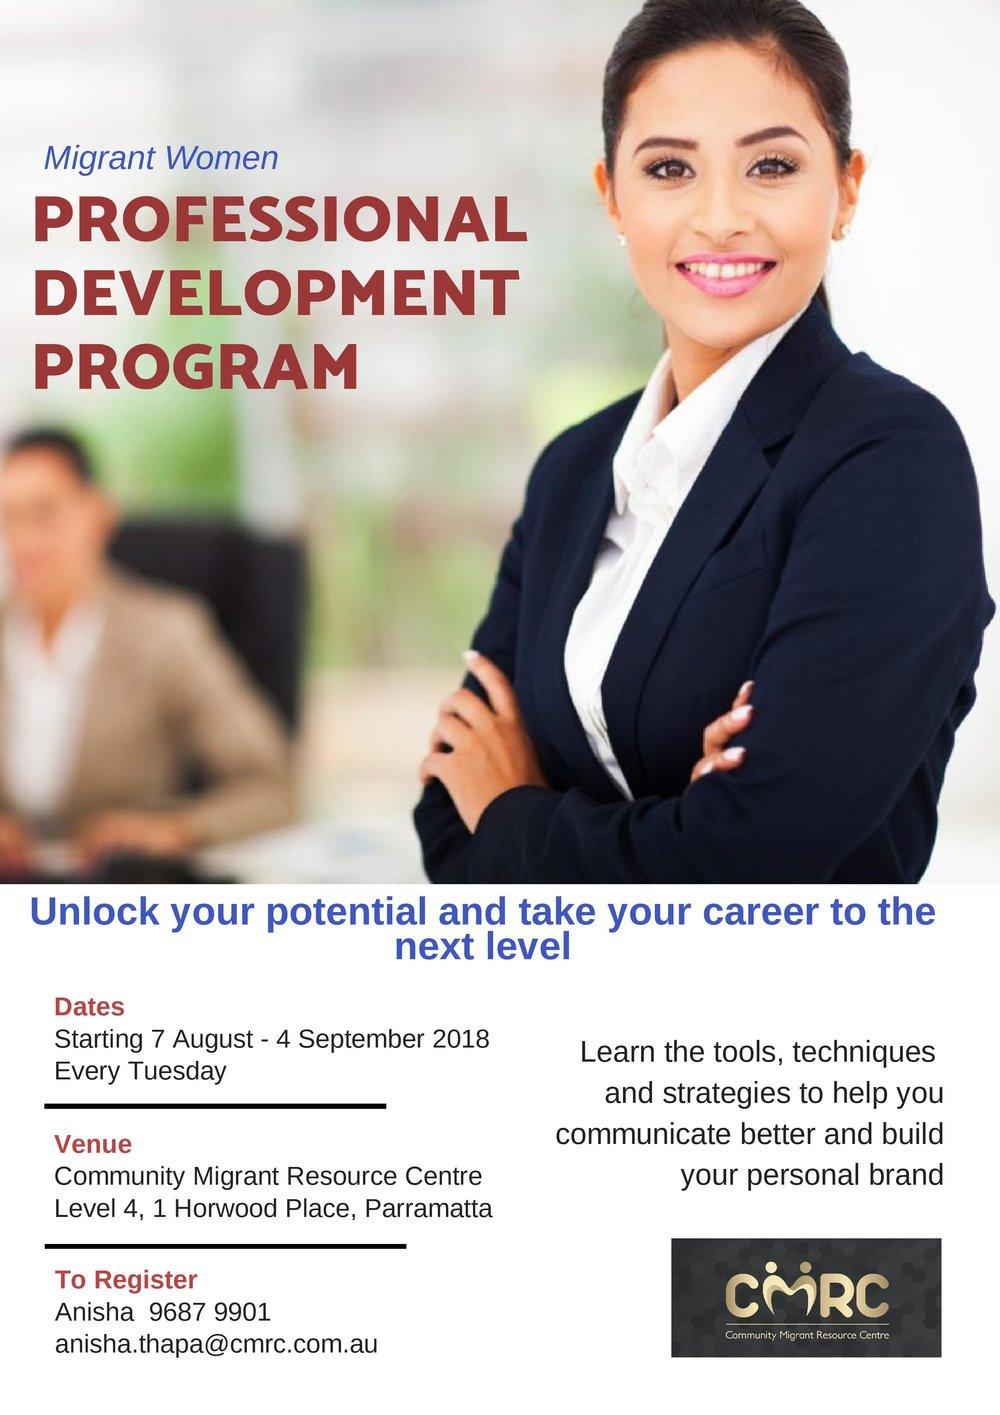 Migrant Women - Professional Development Program-page-001.jpg